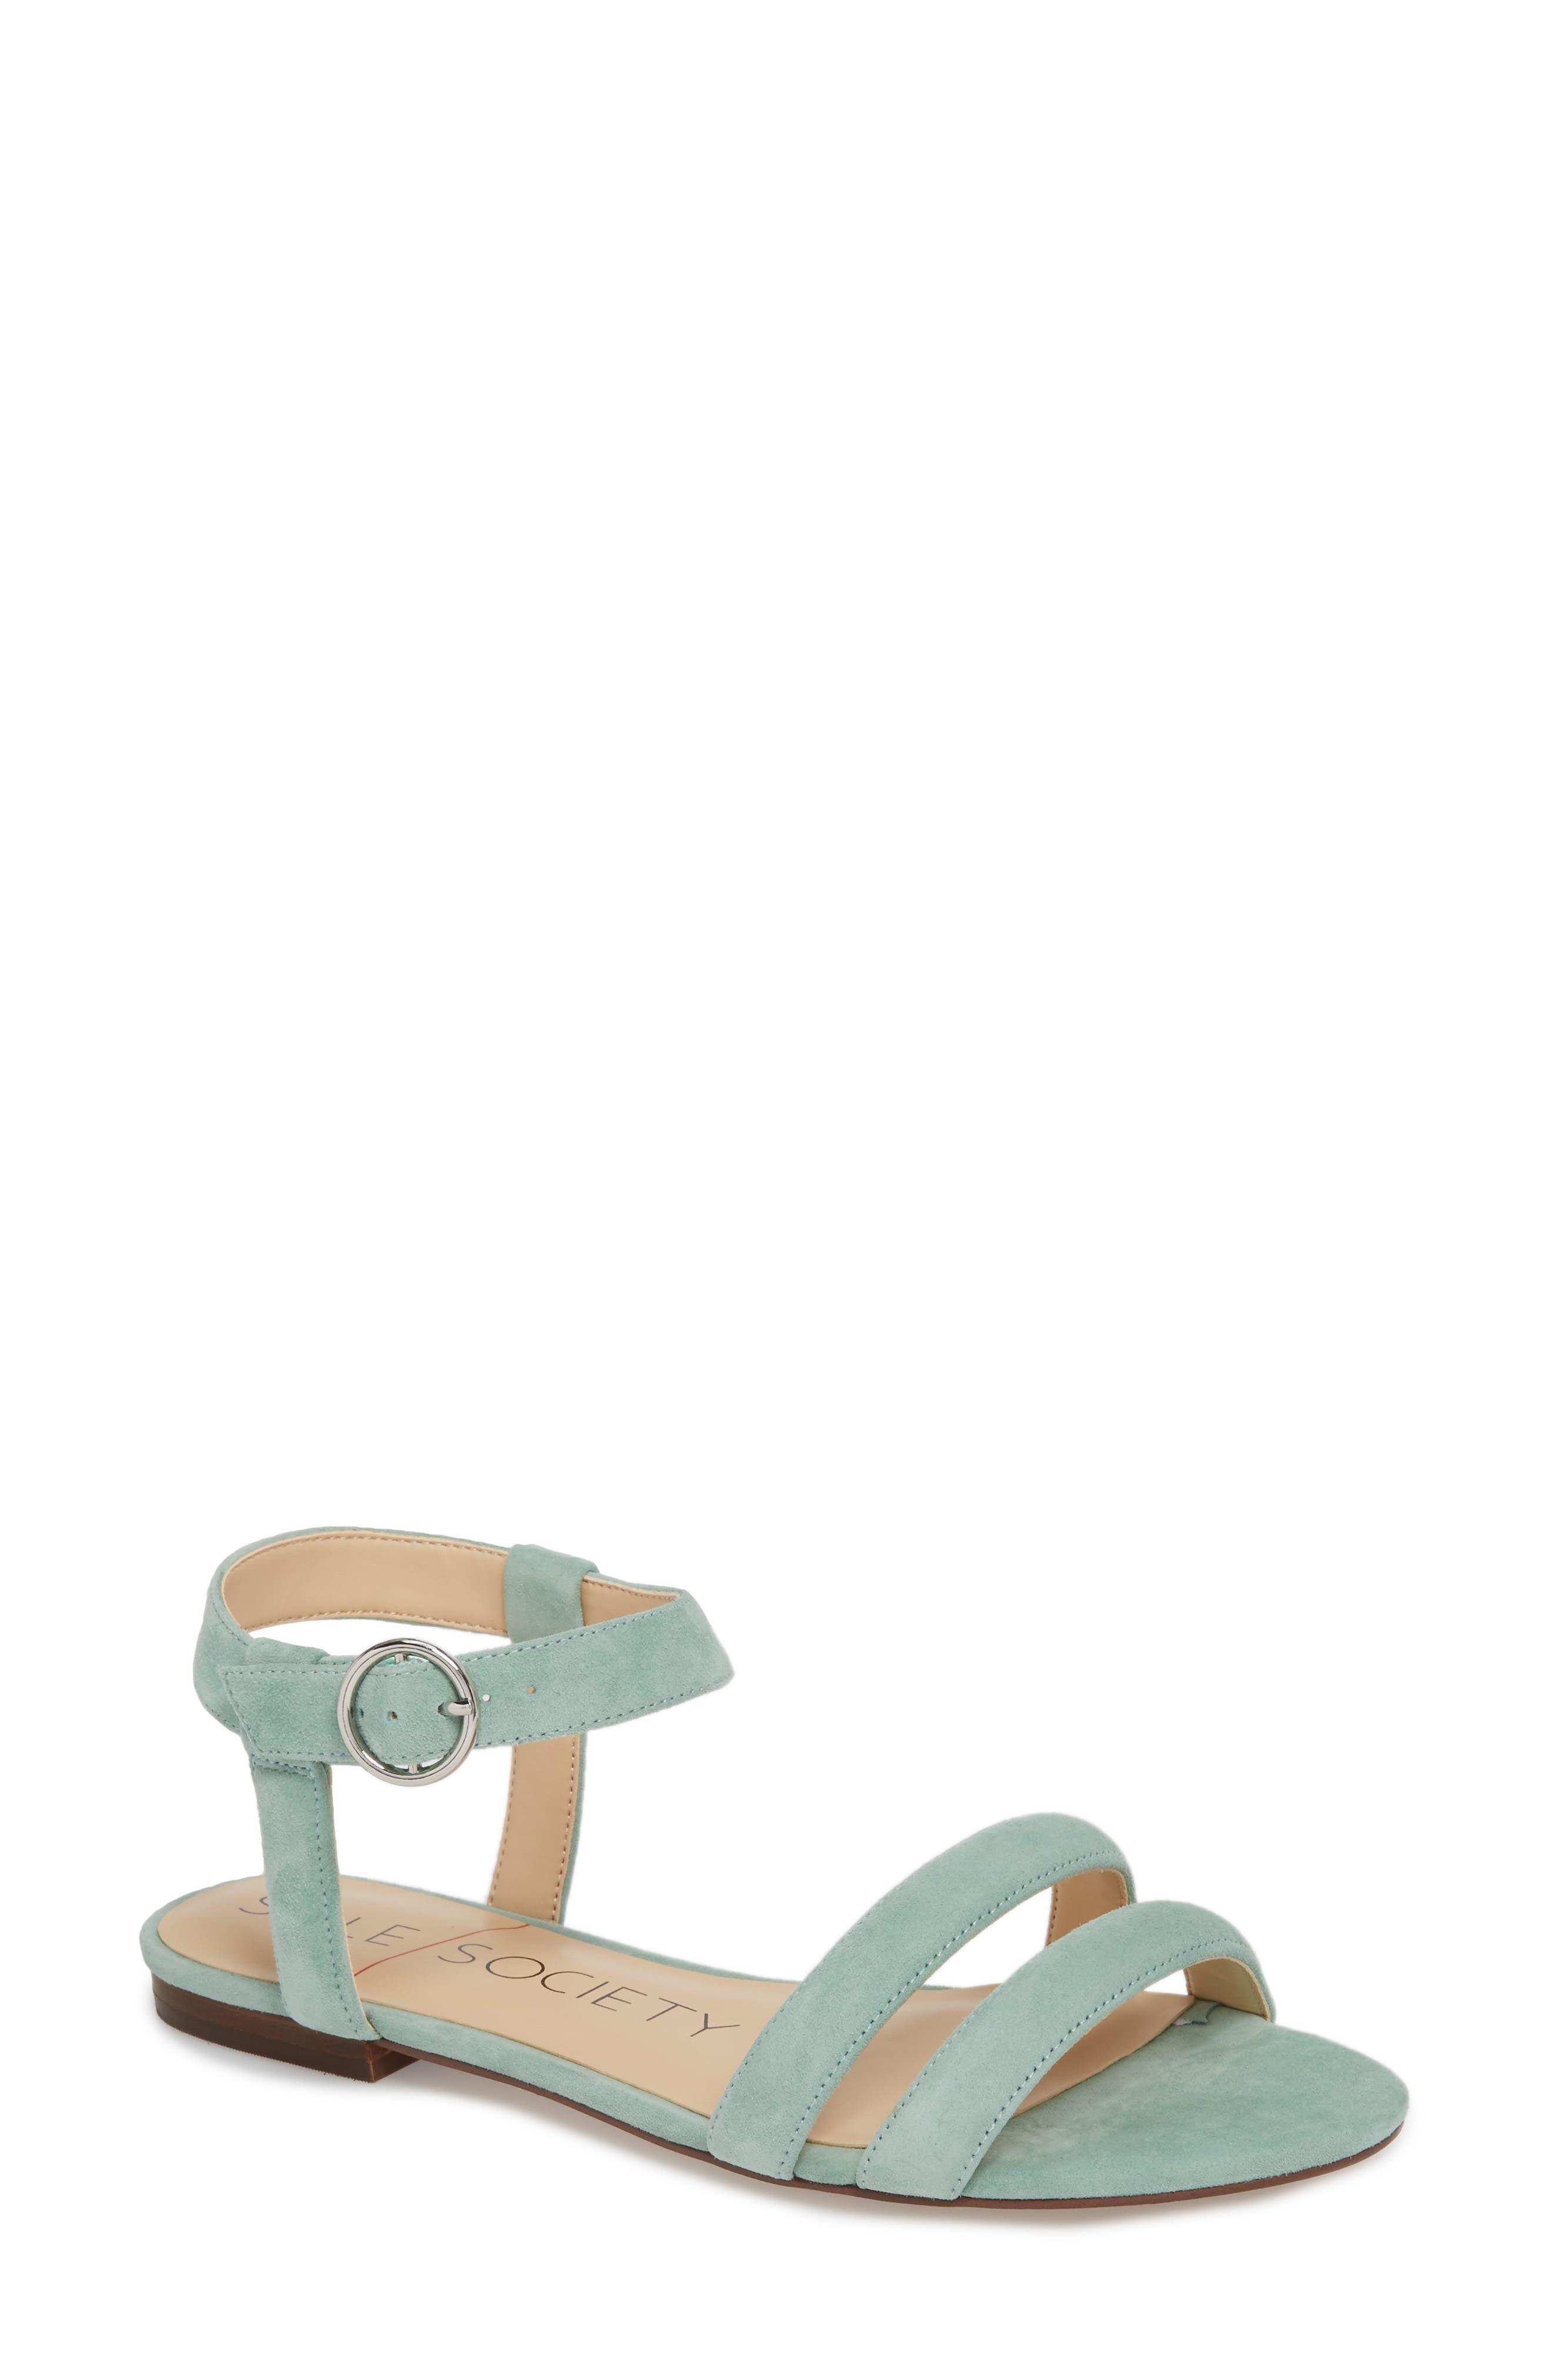 Malie Sandal,                         Main,                         color,